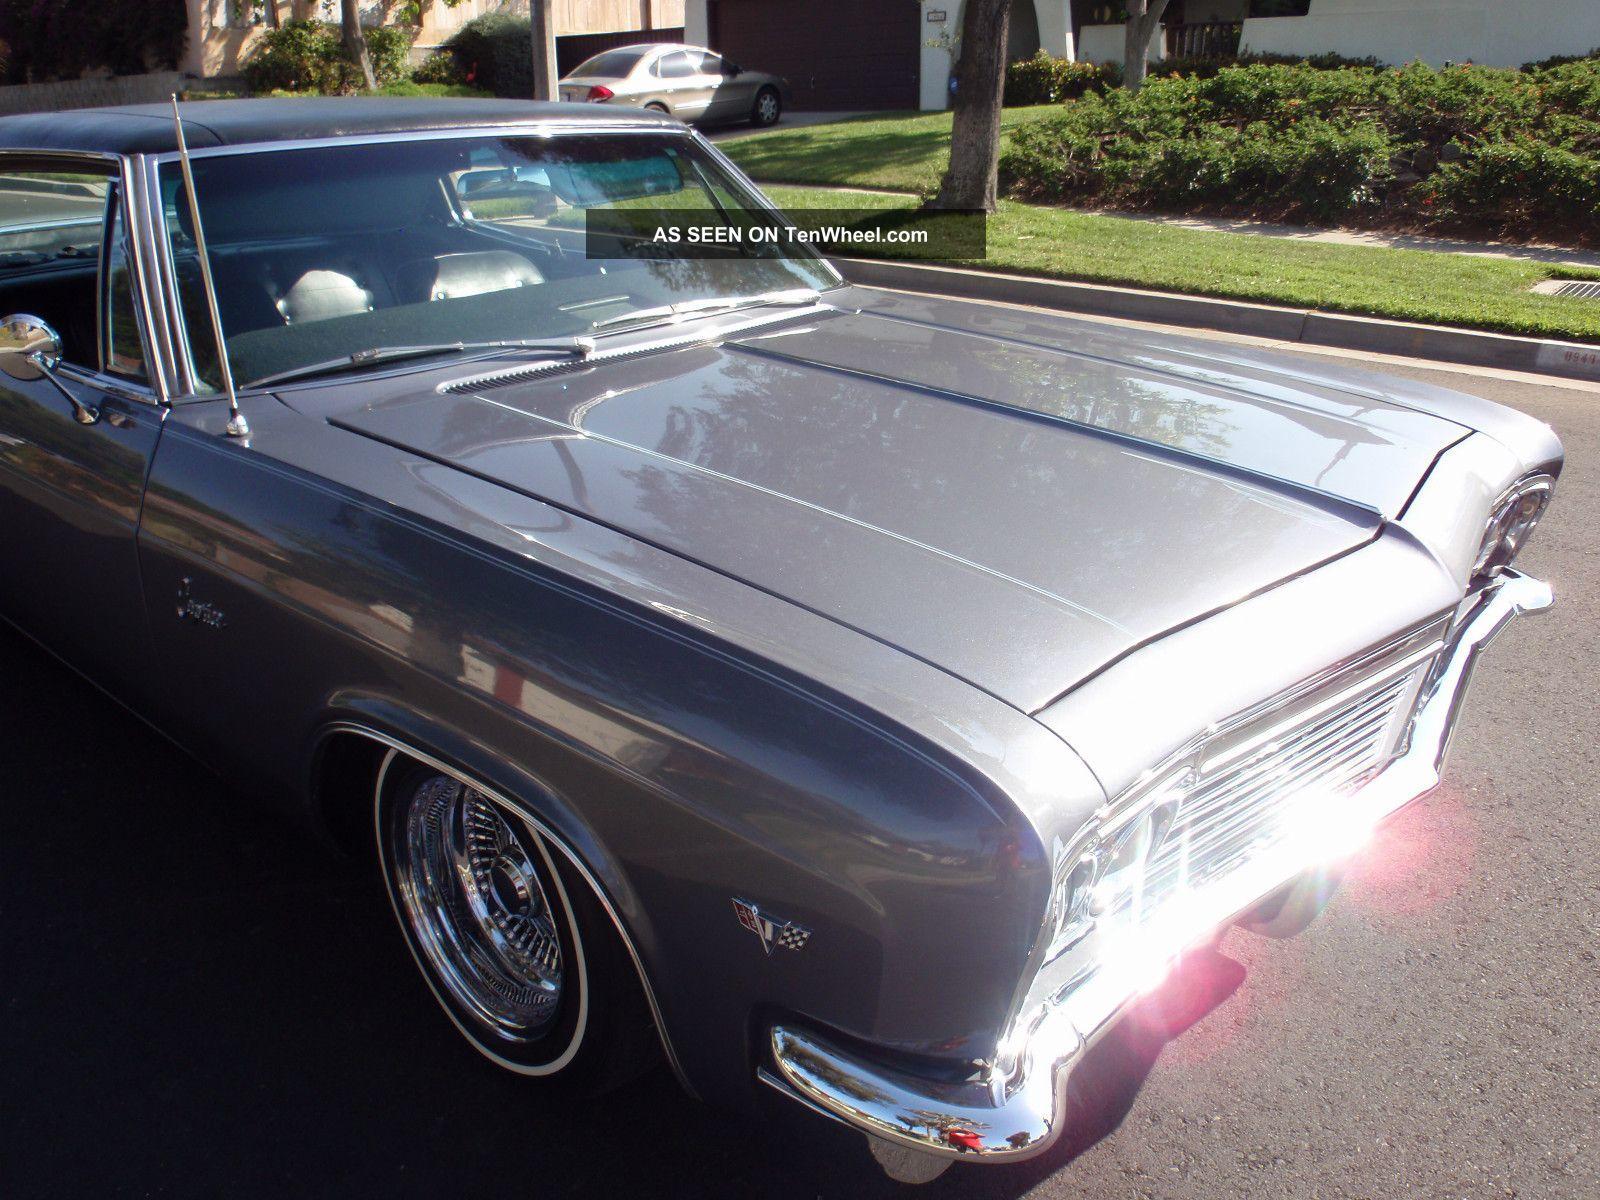 1966 Chevy Impala Caprice Bel Air West Coast Lowrider Chevrolet